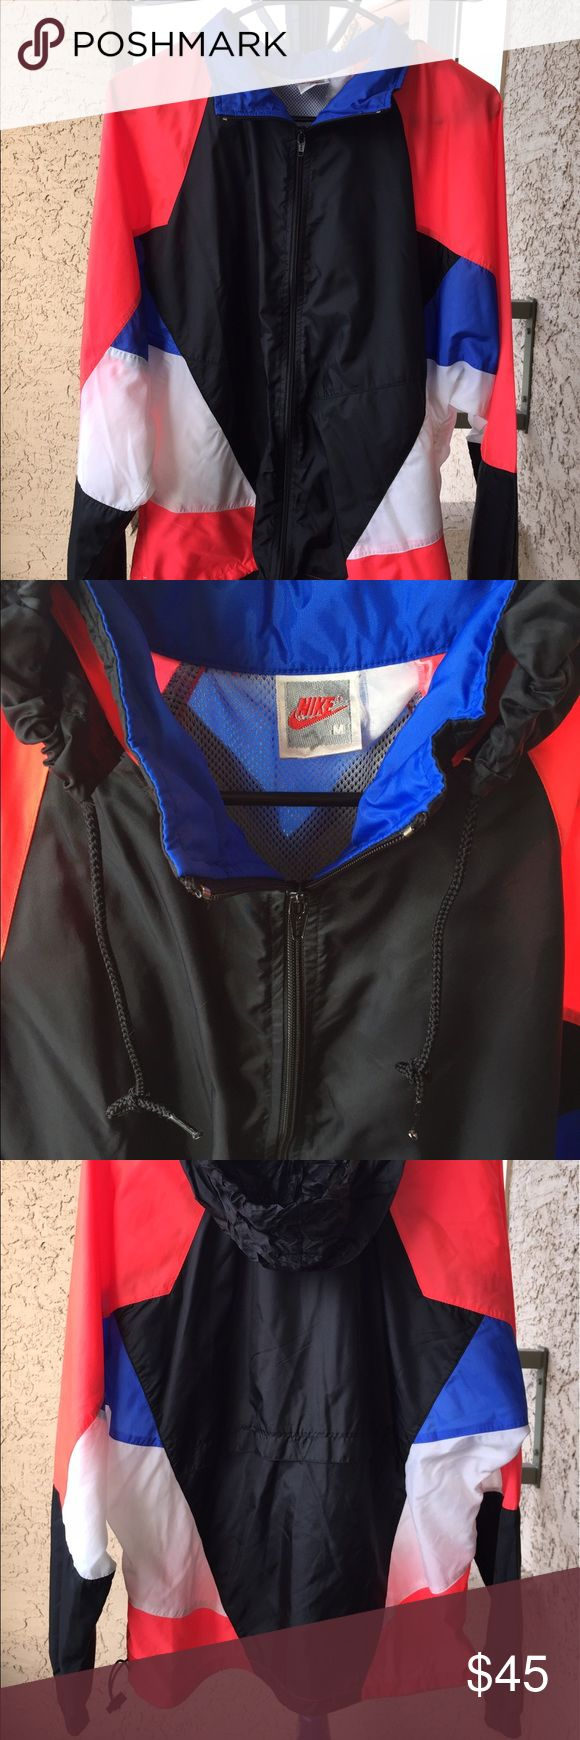 Vintage Nike Windbreaker Medium 90s 80s? Amazing Vintage Nike Windbreaker Jacket. Size Medium. Guaranteed to break Necks Nike Jackets & Coats Windbreakers